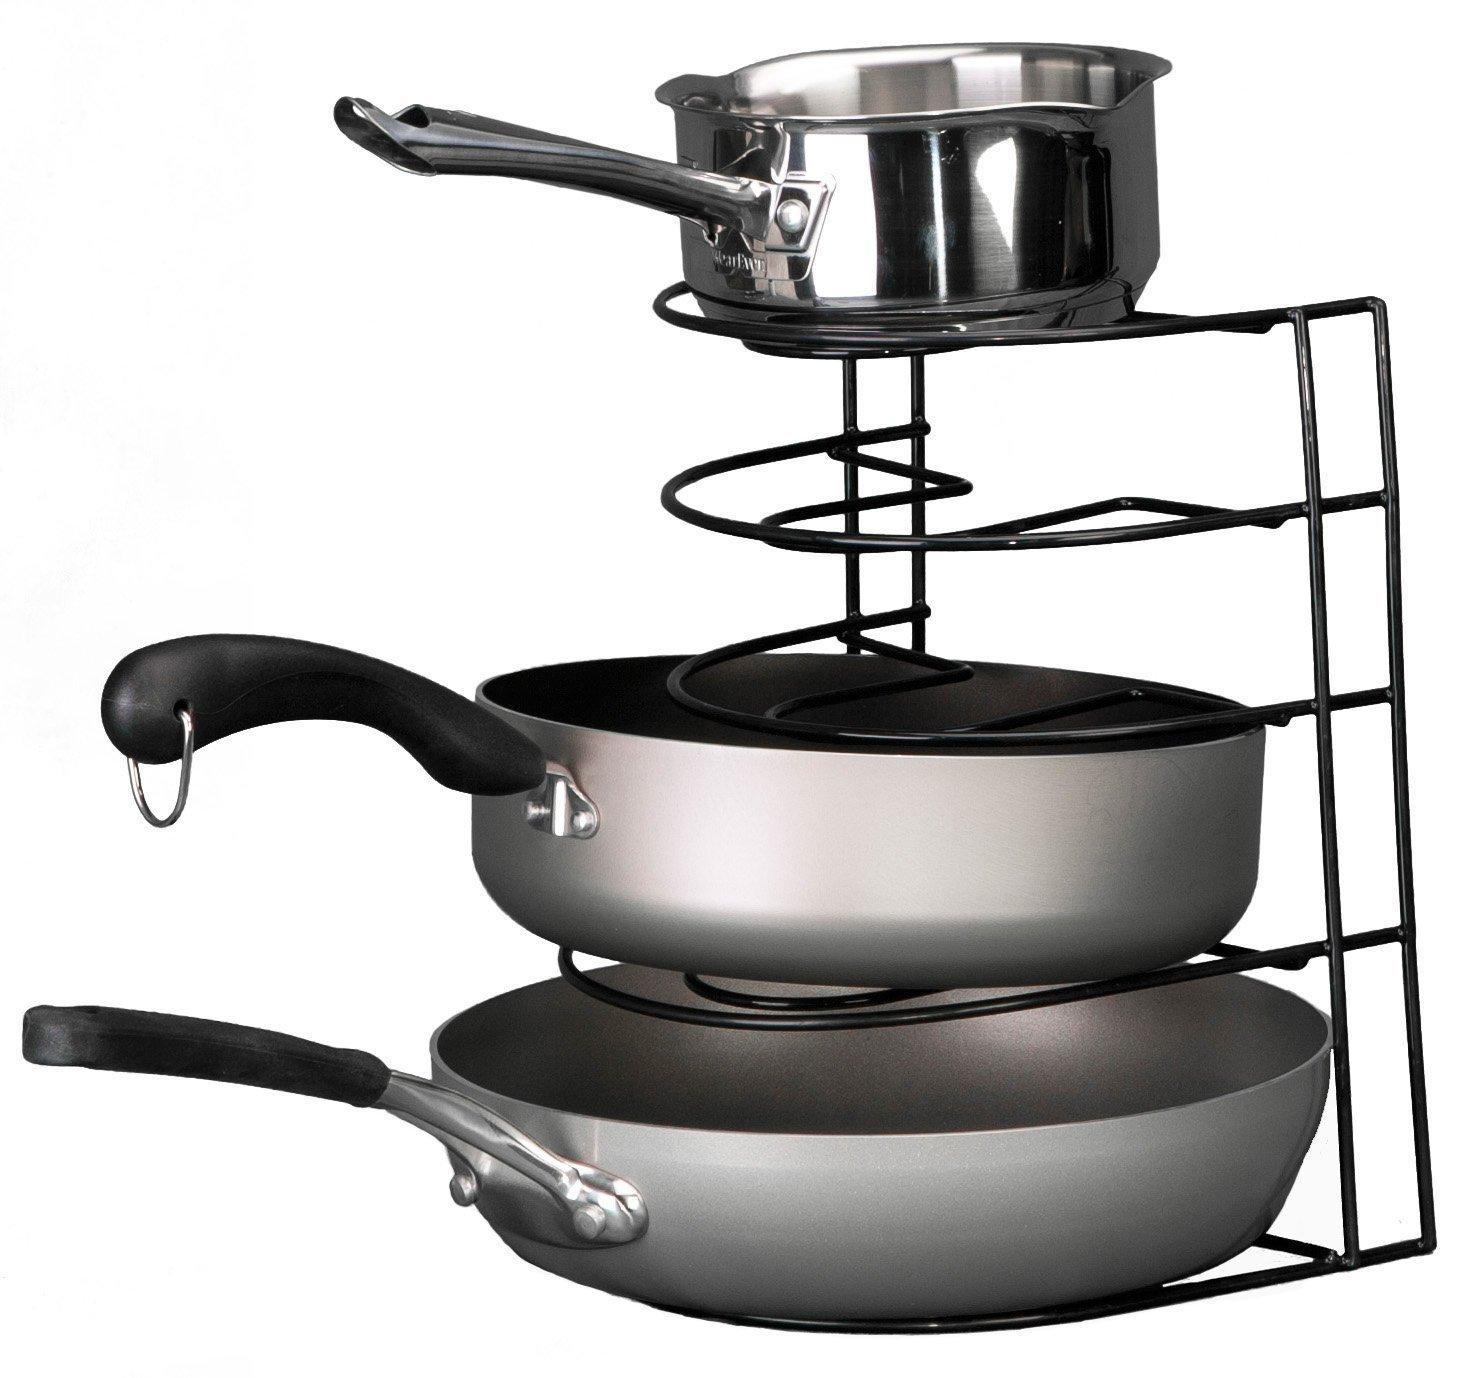 Lid Maid Pot Pan Lid Organizer: Cookware Storage Holder Fry Pan Organizer Kitchen Cabinet